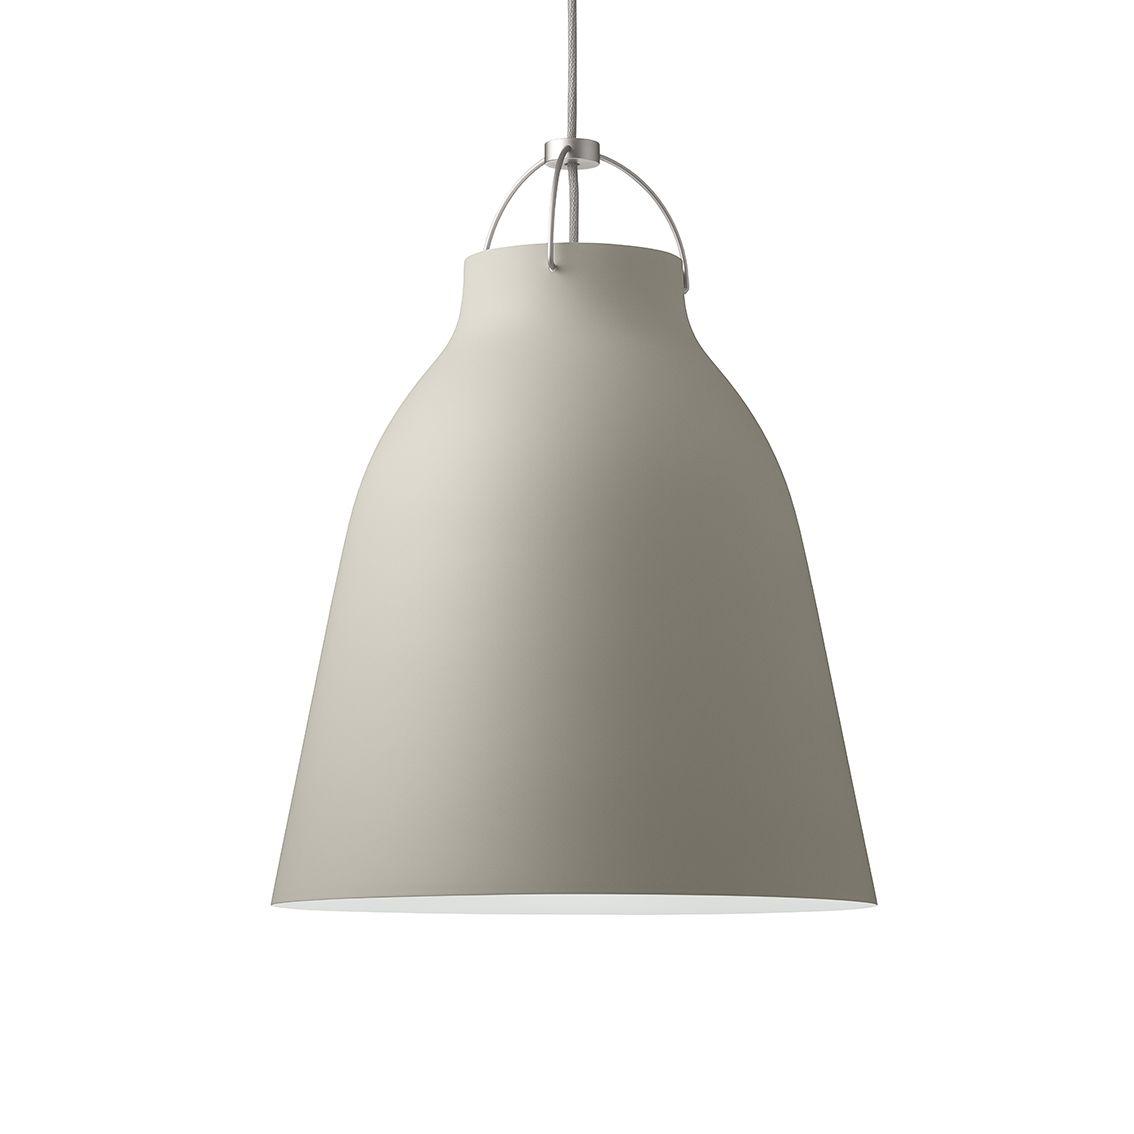 Caravaggio hanglamp Lightyears Ø26 Warm Silk